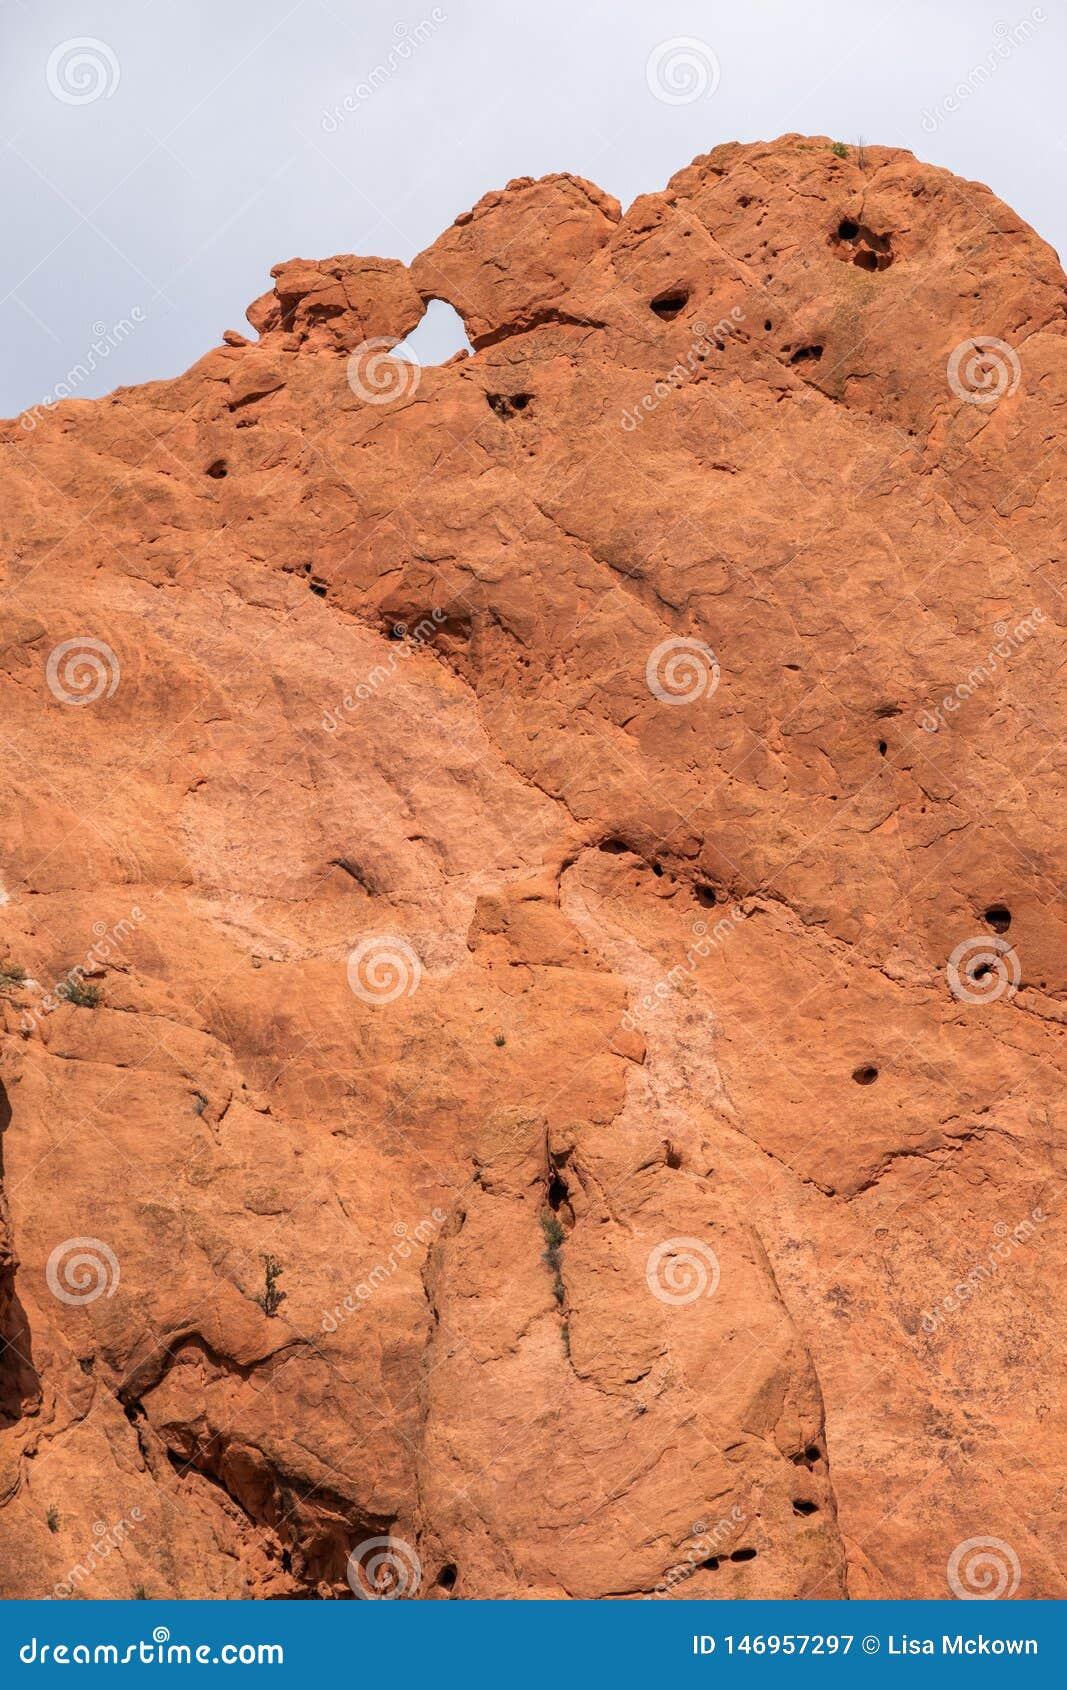 Kissing Camels Garden Of The Gods Colorado Springs Rocky